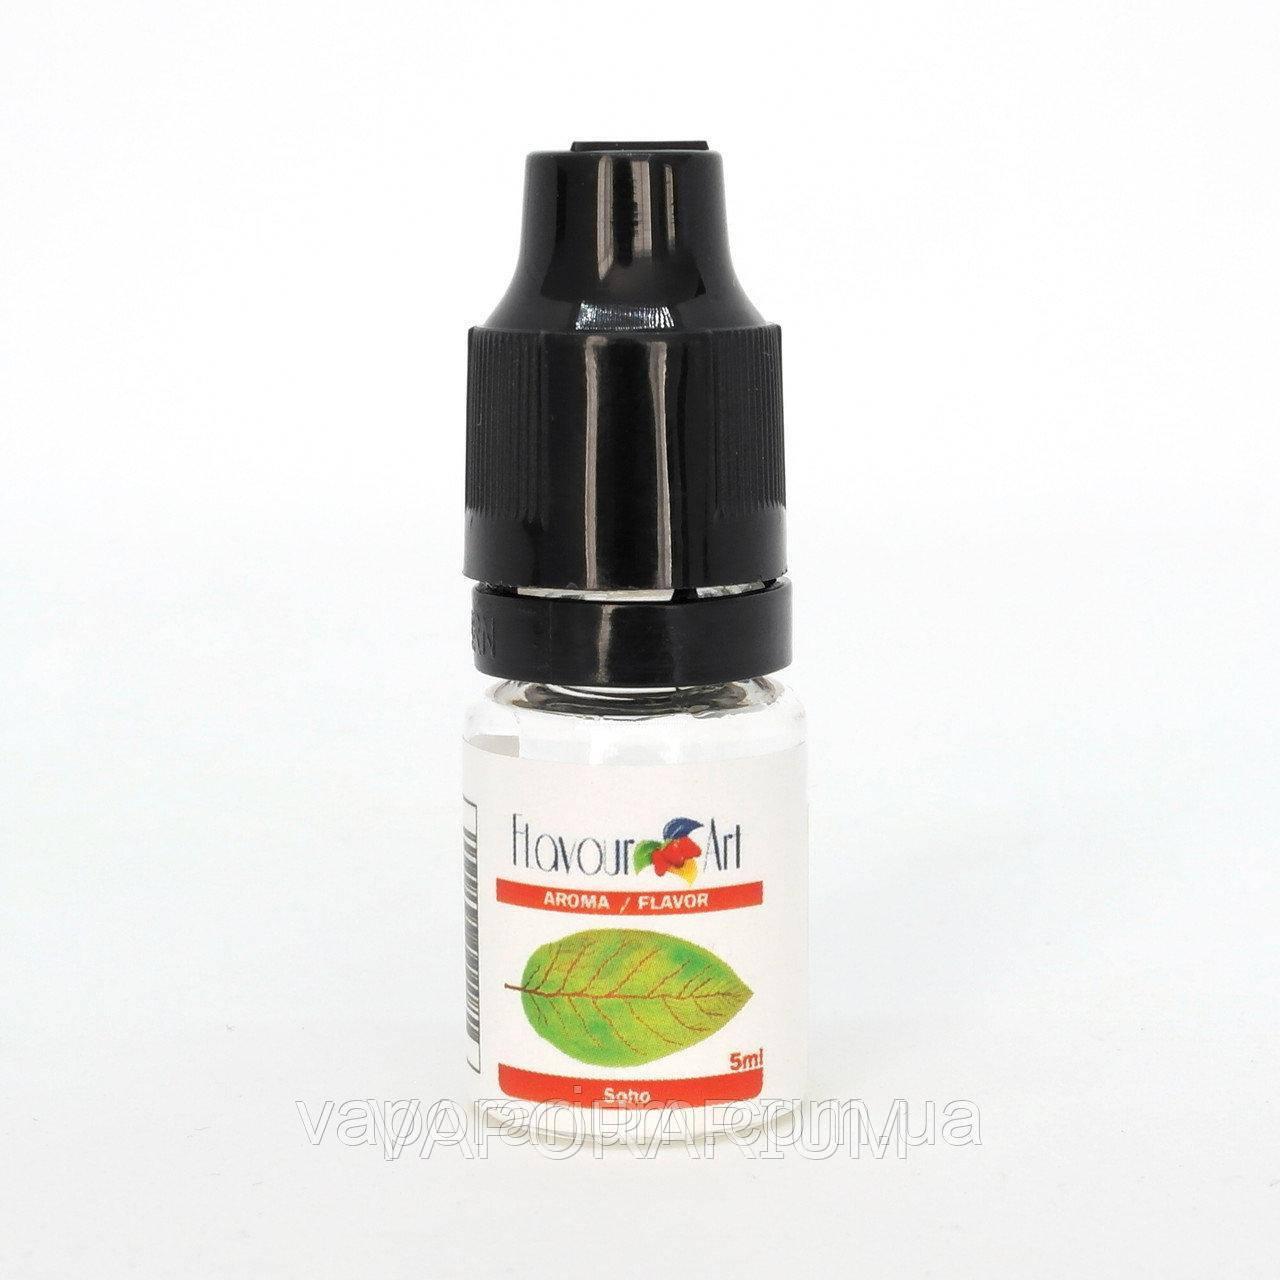 Ароматизатор FlavourArt Soho (Сохо-Табак) 5 мл. (0317)